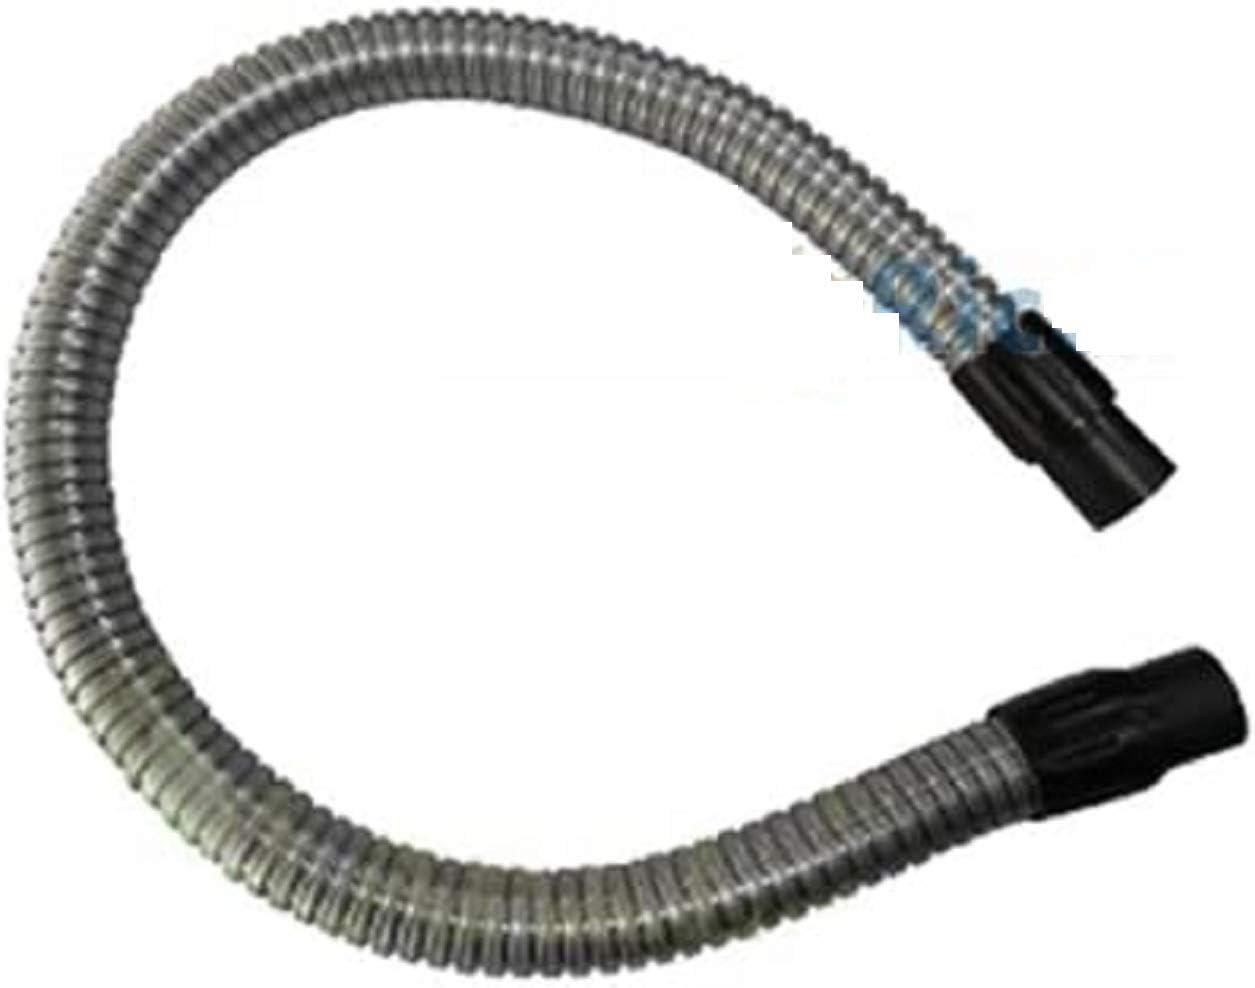 Tubo flexible 110 Cm Para Aspirador Cenizas cenerill – Estufa de pellets chimeneas: Amazon.es: Hogar